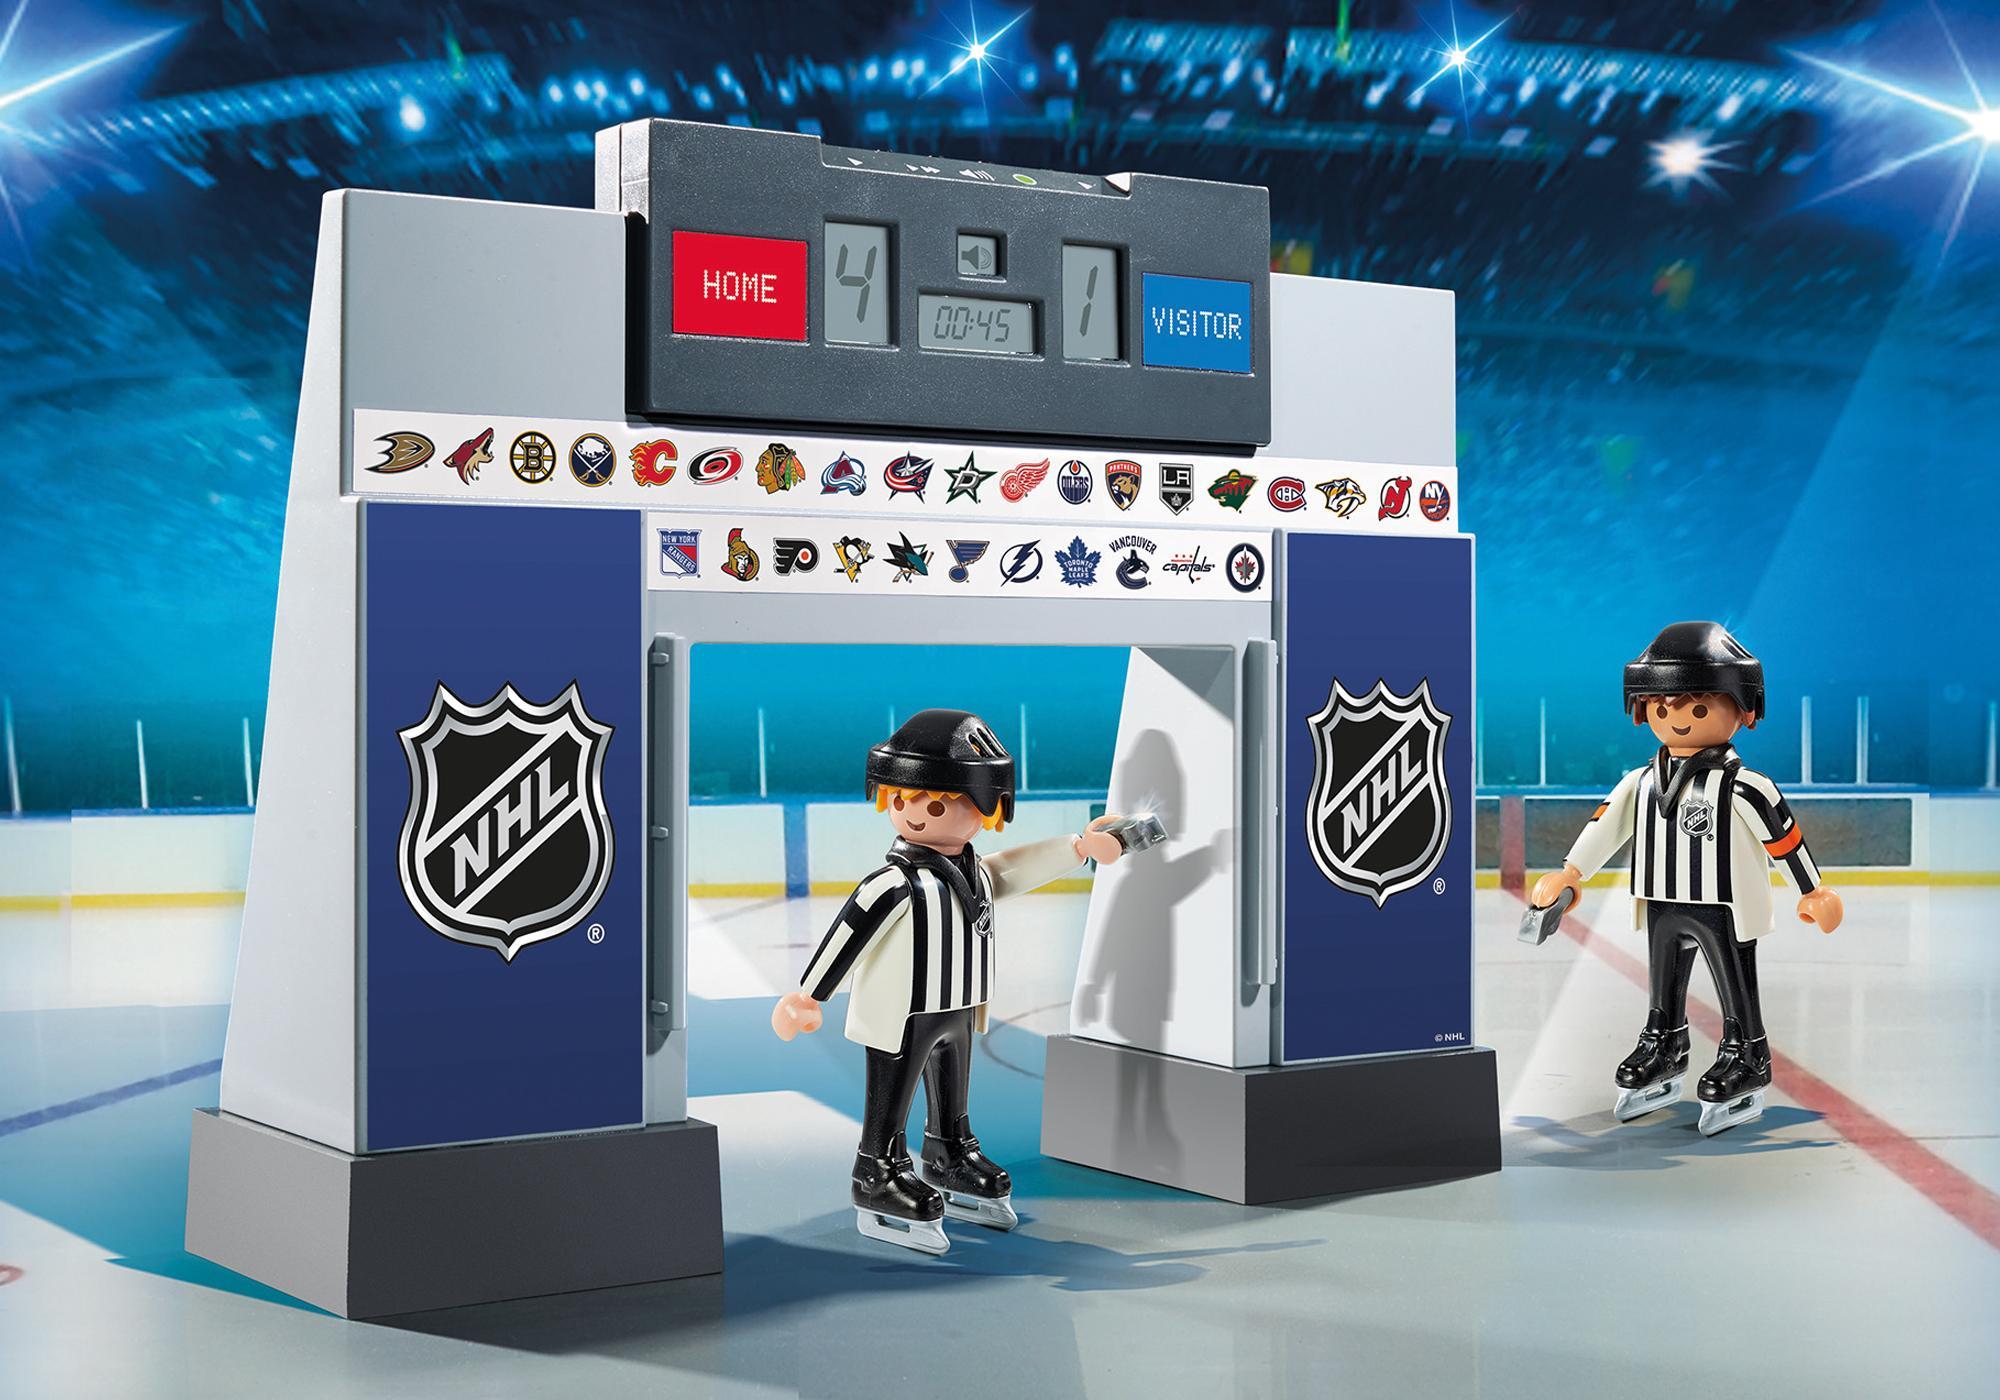 http://media.playmobil.com/i/playmobil/9016_product_detail/NHL® Score Clock  with 2 Referees